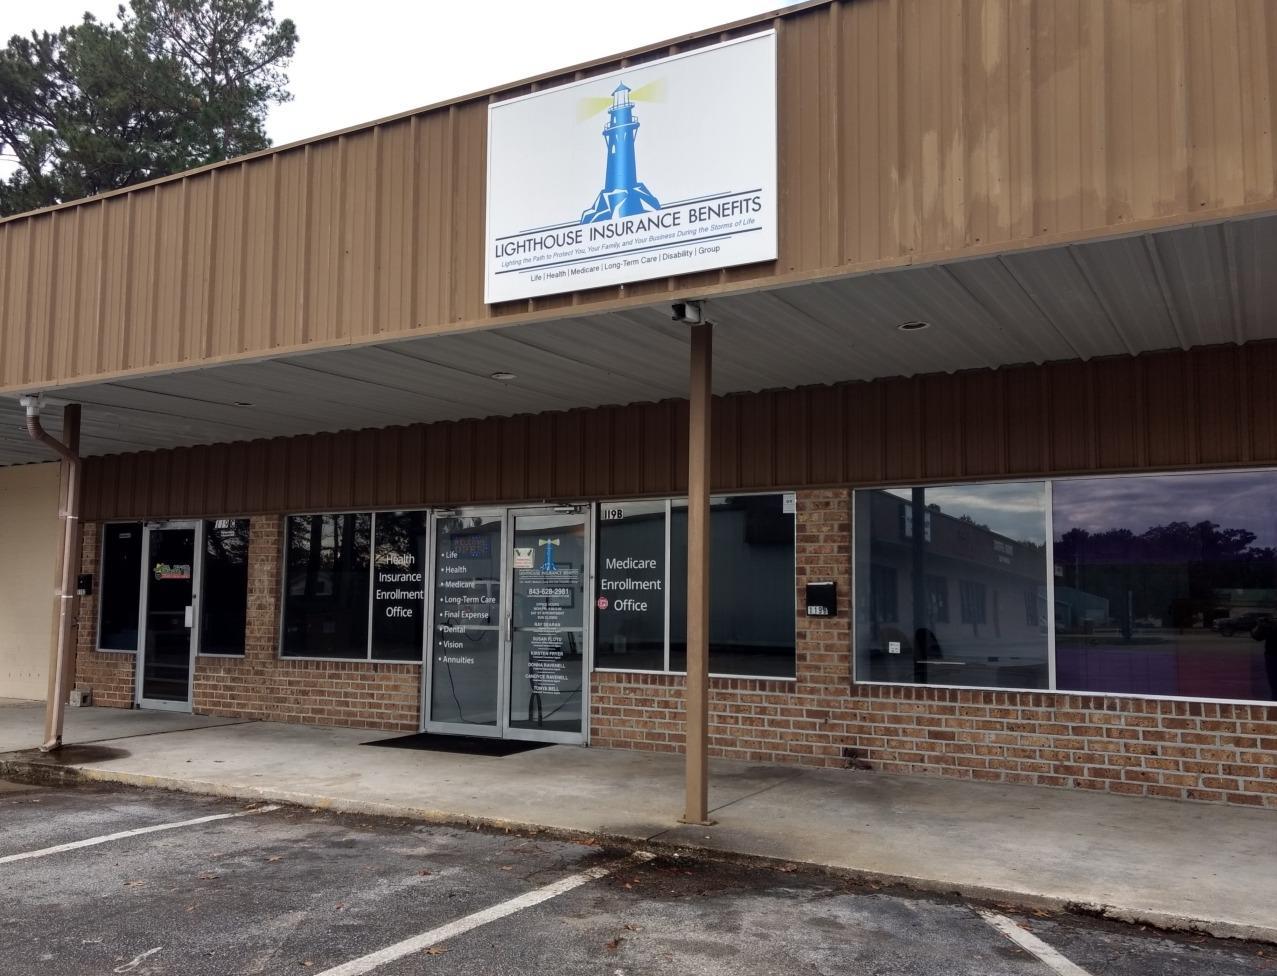 Lighthouse Insurance Benefits | Charleston Insurance Agency image 0